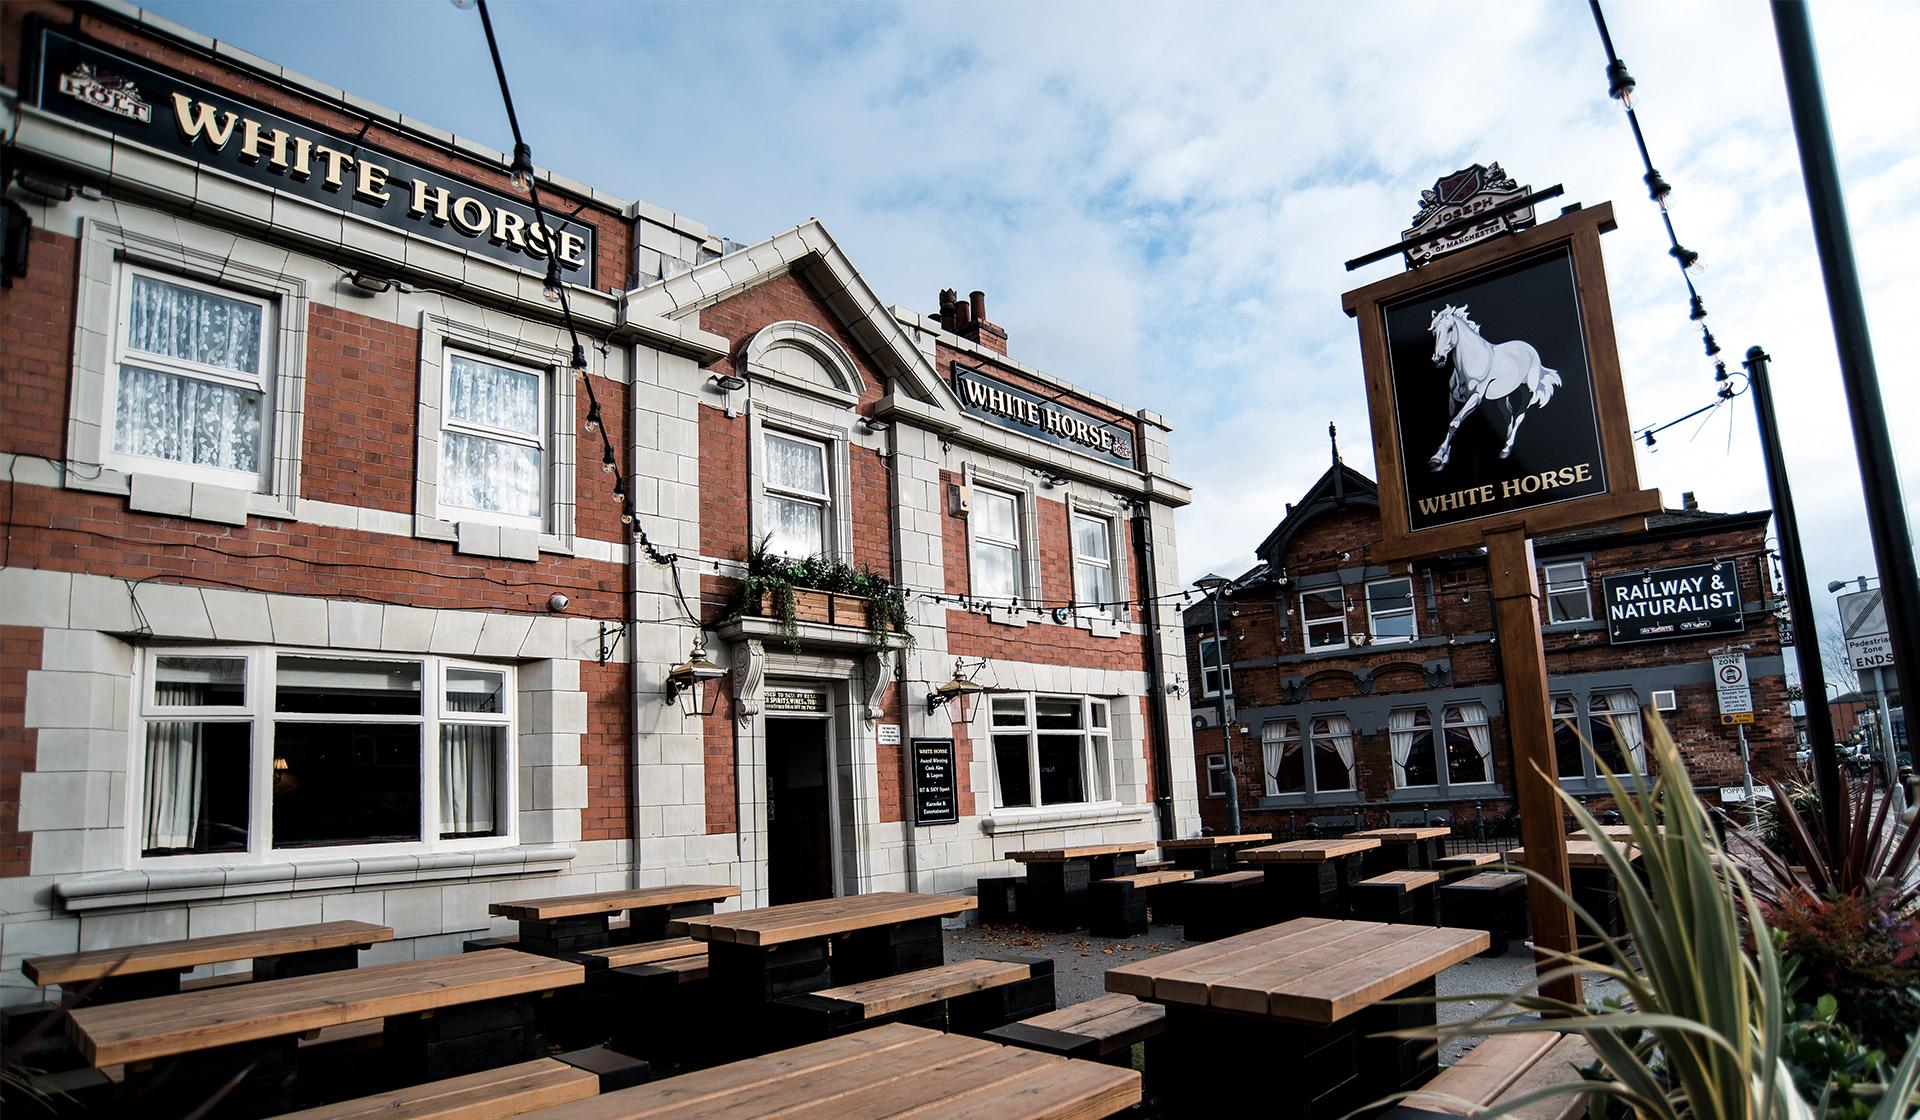 white horse featured pub in prestwich